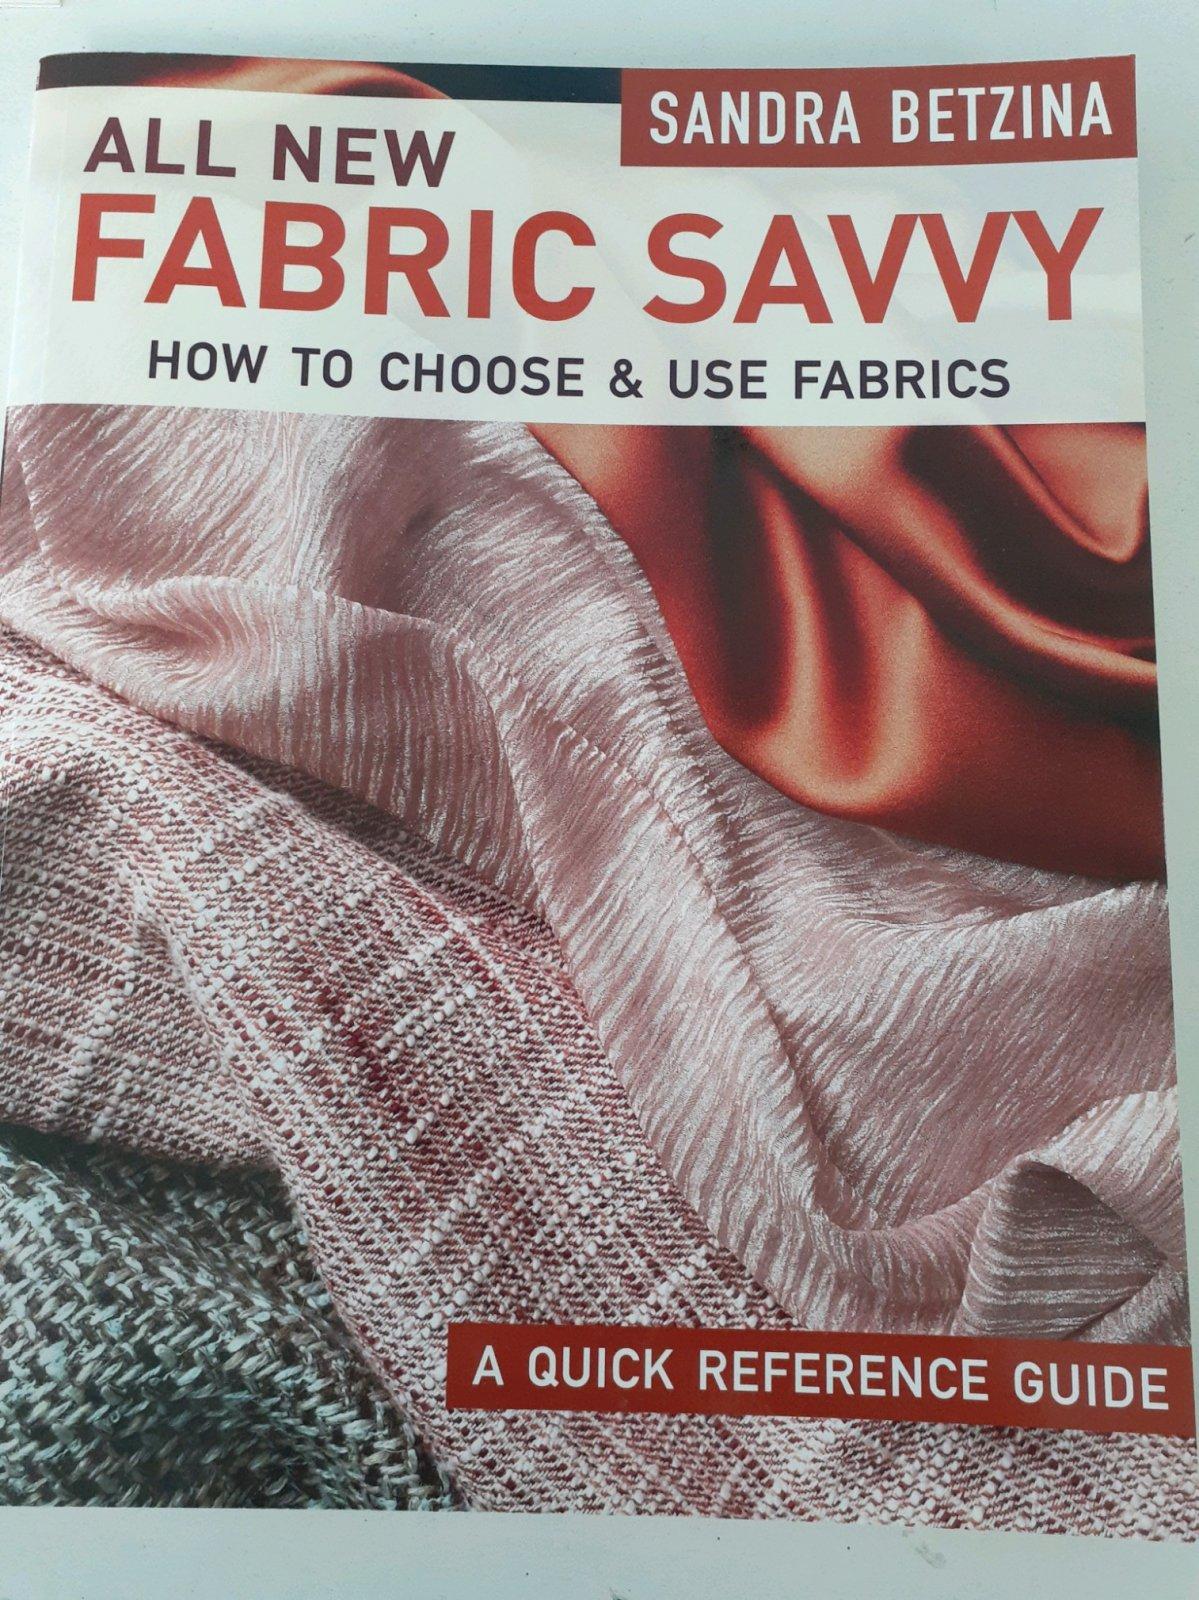 Fabric Savvy - Sandra Betzina